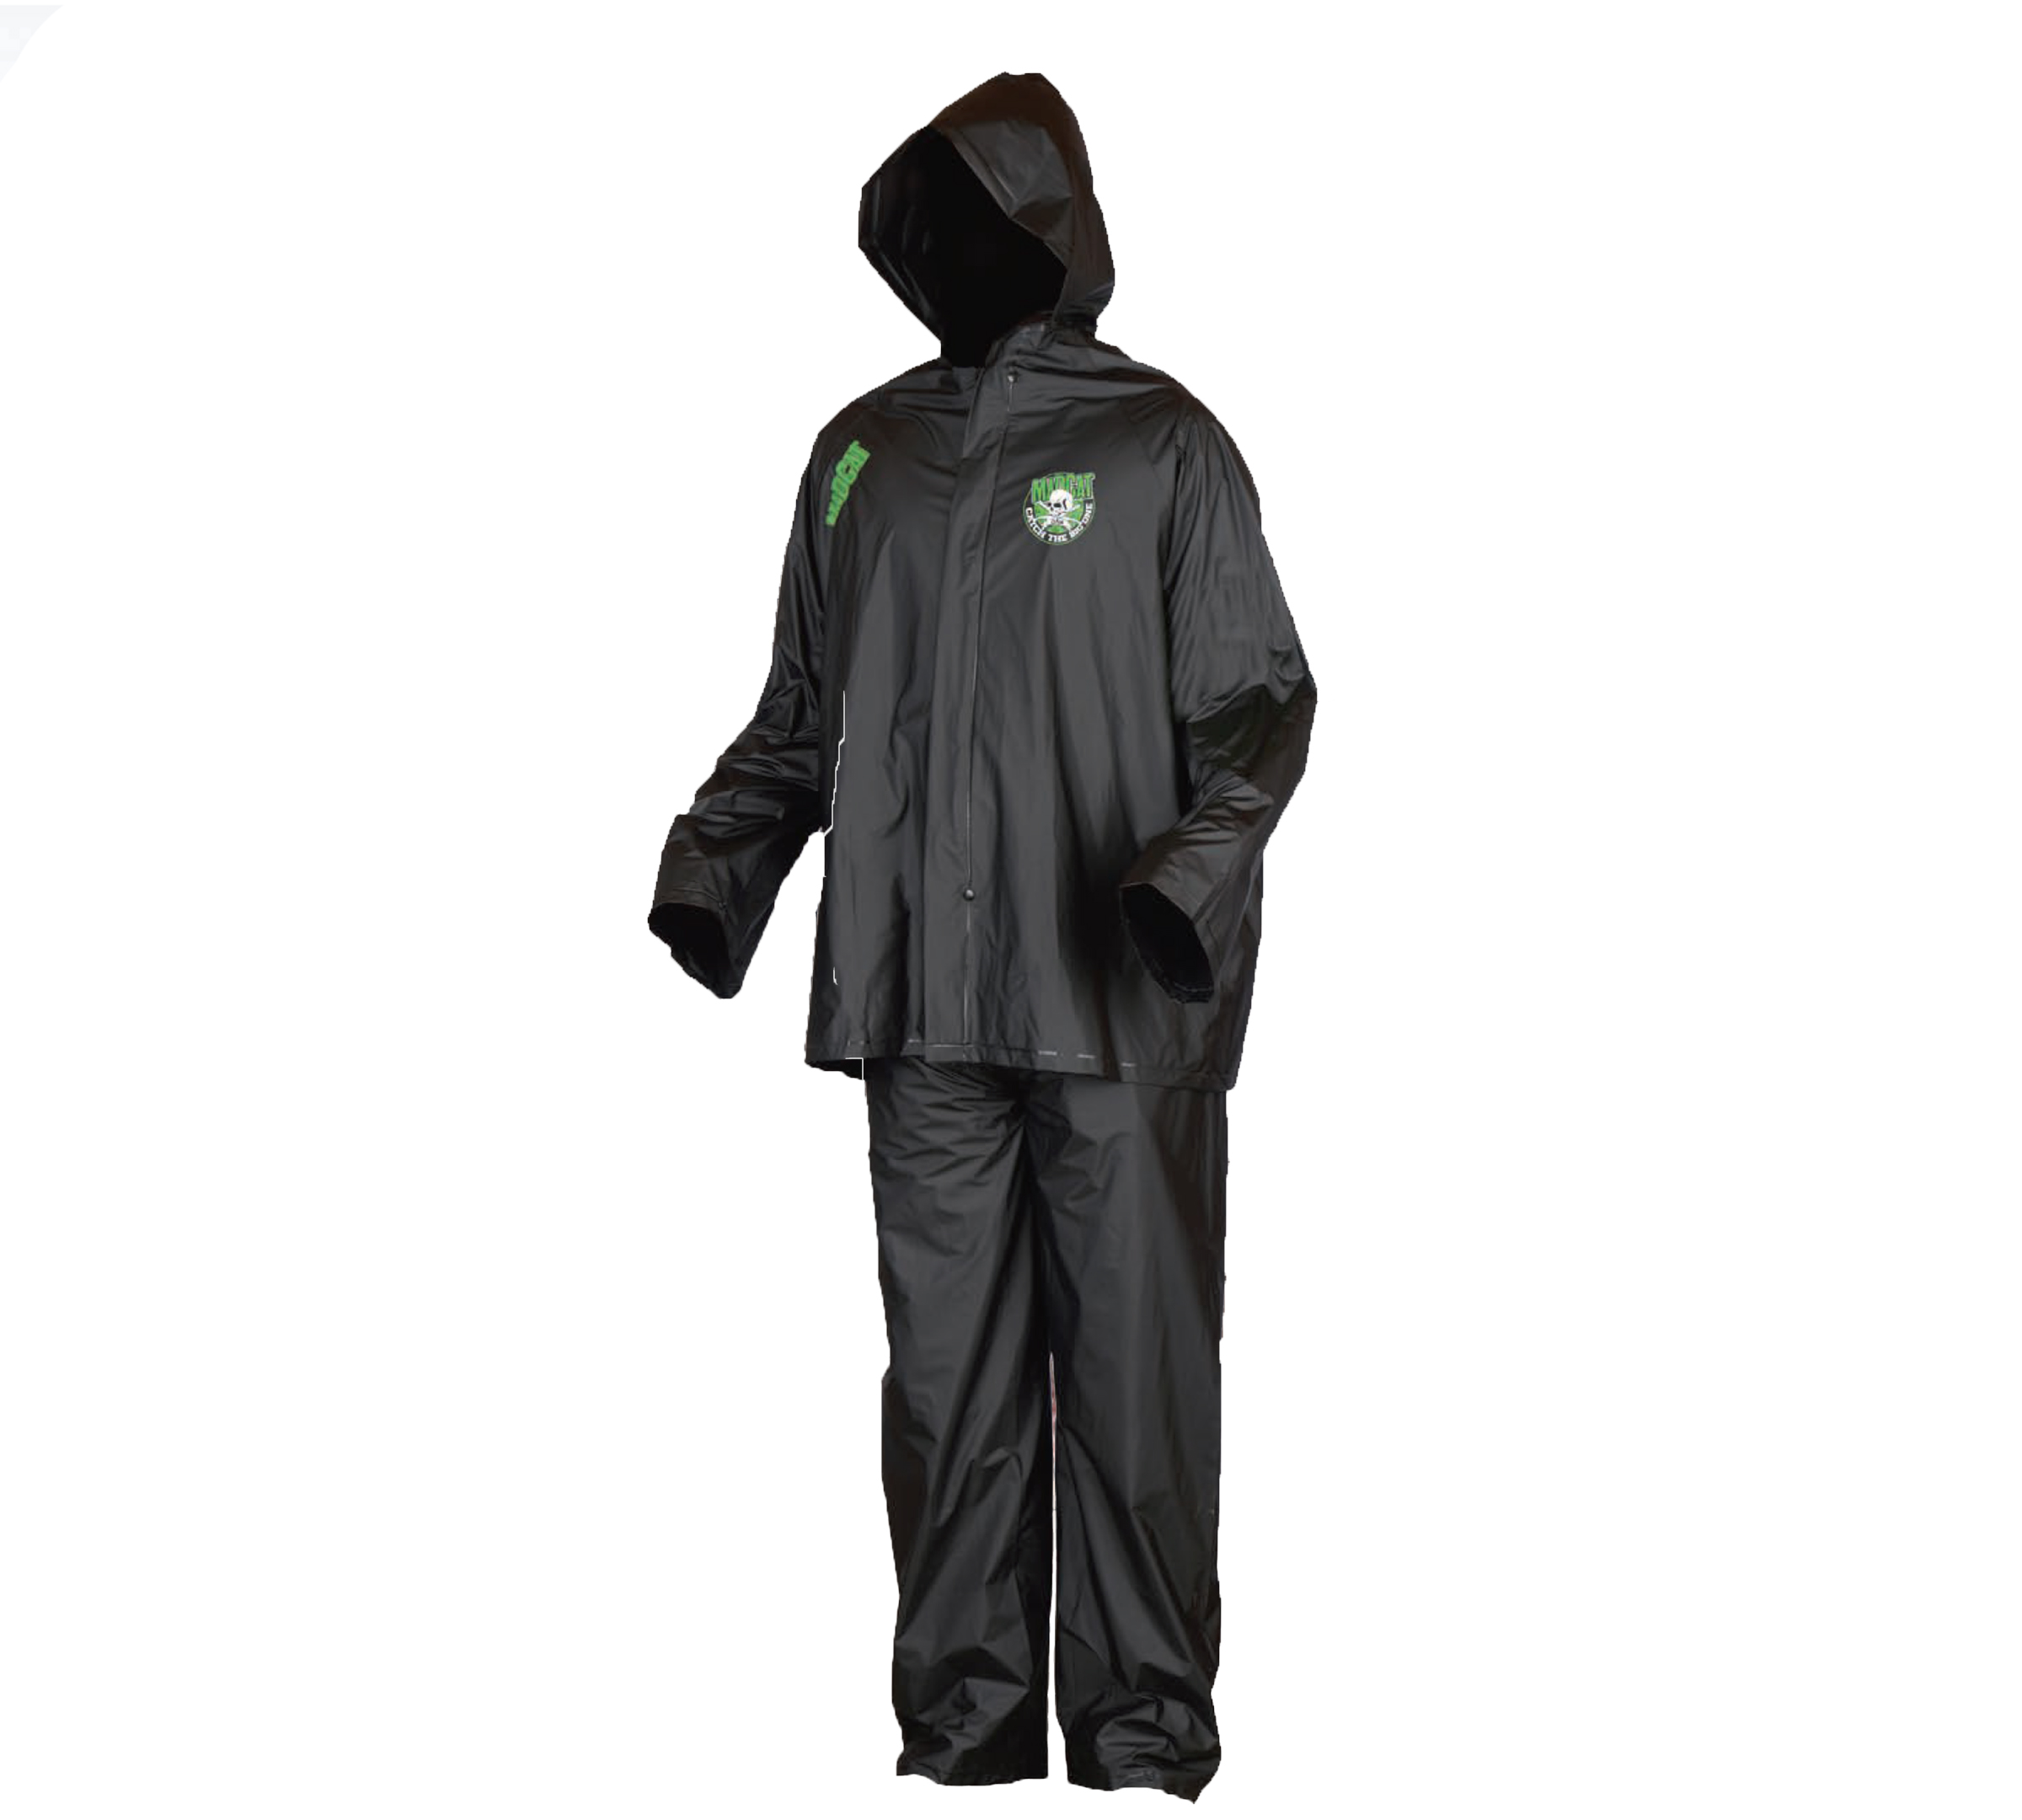 MADCAT nepromokavý oblek DISPOSABLE ECO SLIME SUIT vel. XL